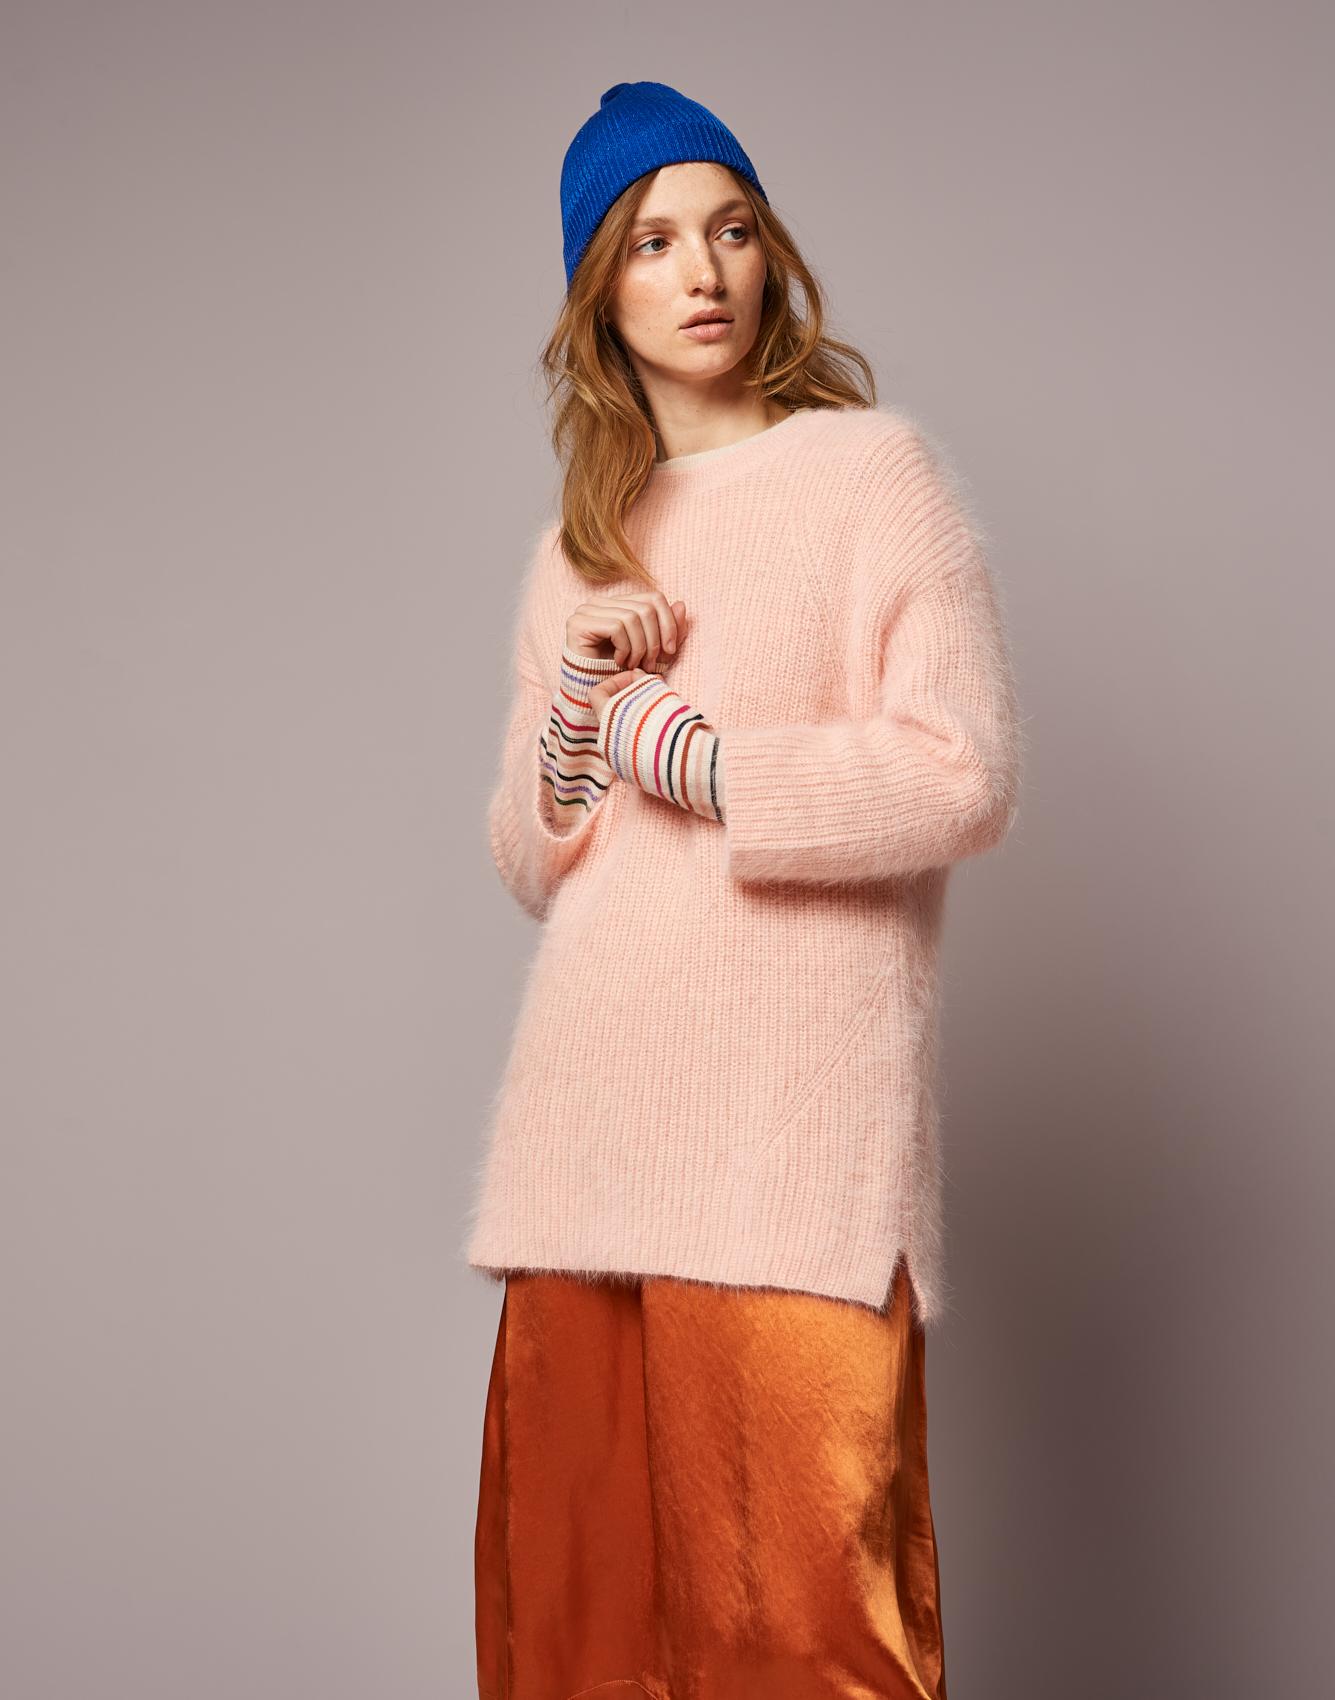 Knitwear Datou  -  Knitwear Gopew  -  Skirt Lambda